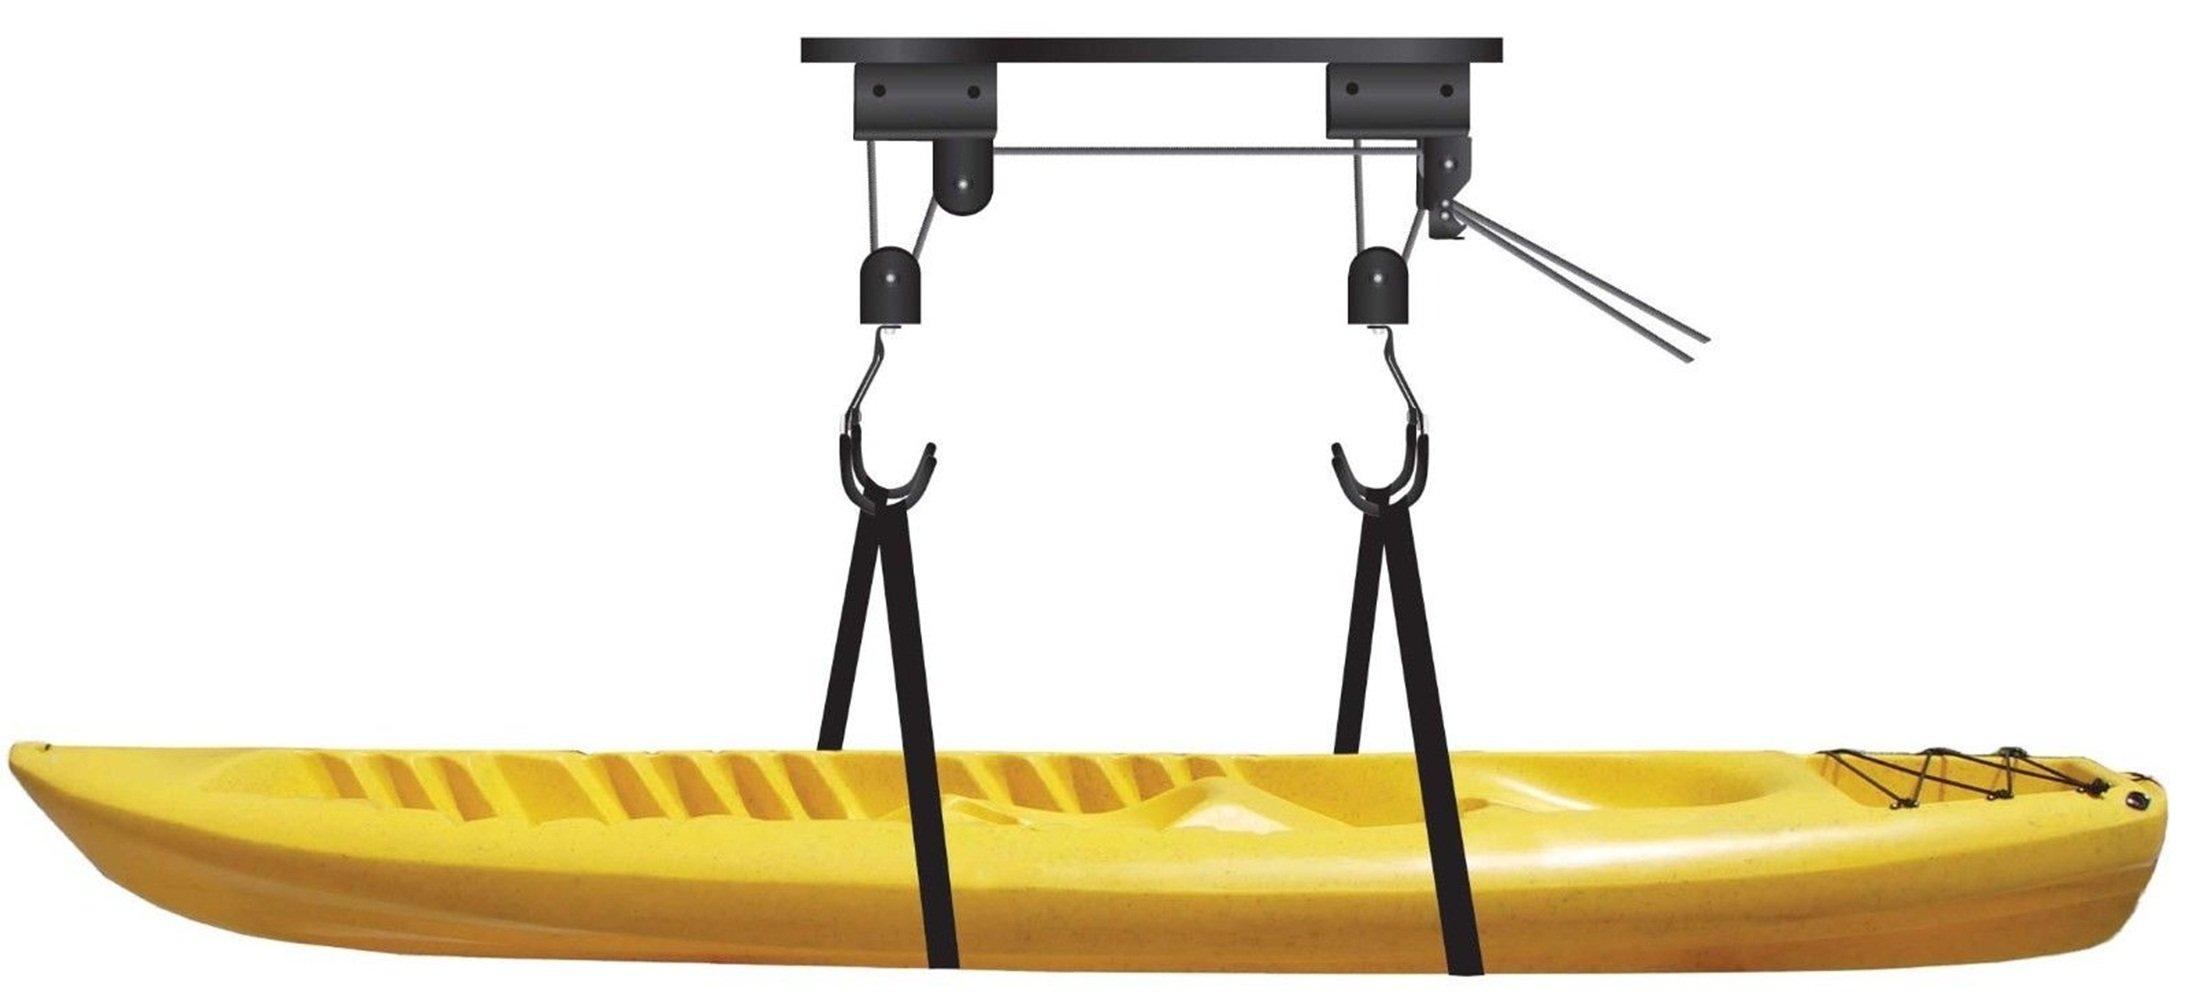 Kayak Hoist Storage System Canoe Garage Ceiling Hanging Lifting System